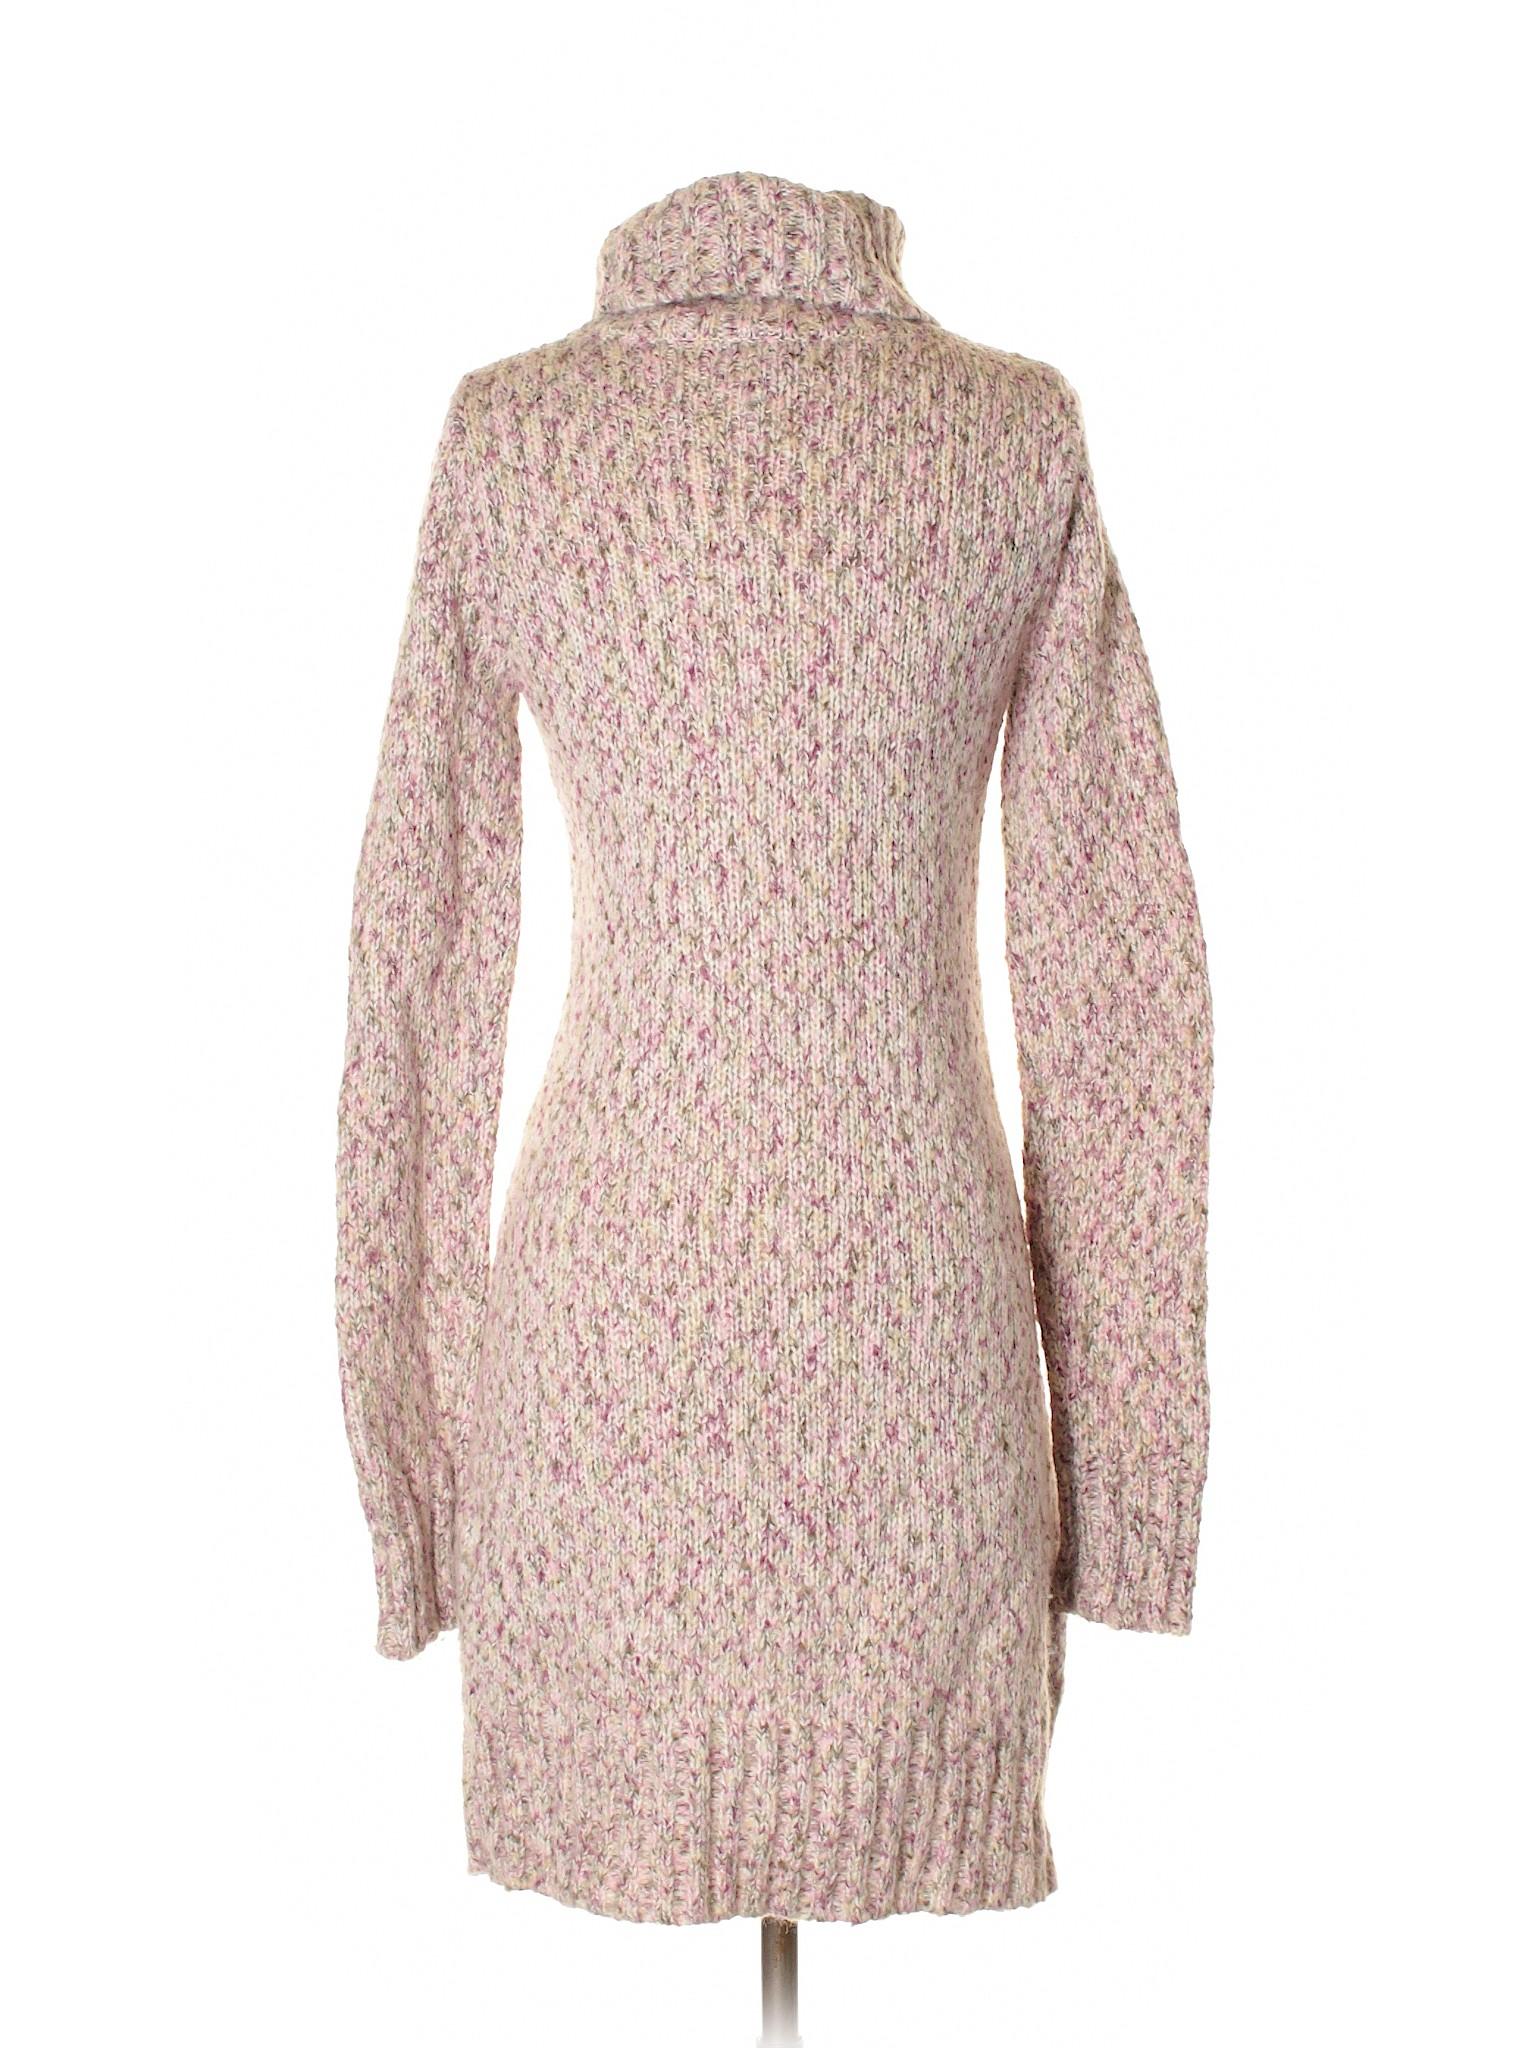 Casual Collection Parrish Dress Boutique winter Kim pIzqxwzUa